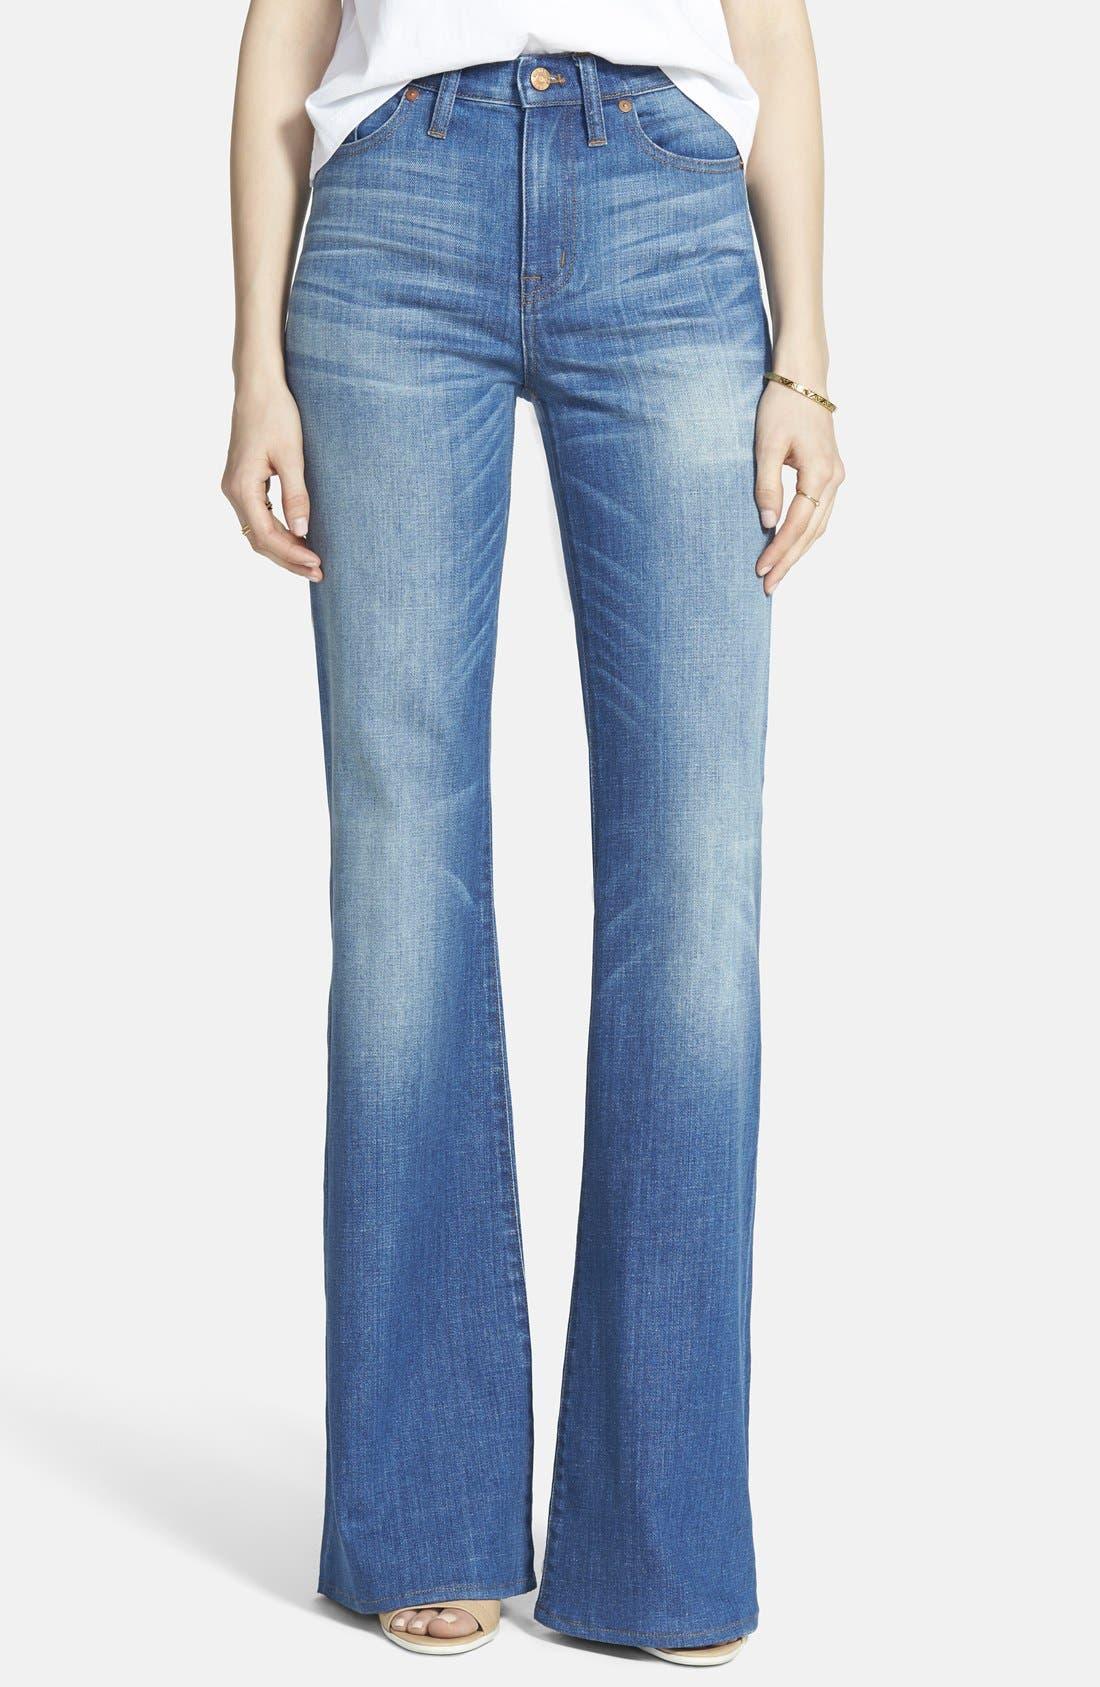 Alternate Image 1 Selected - Madewell 'Flea Market Flare' High Rise Jeans (Thom)